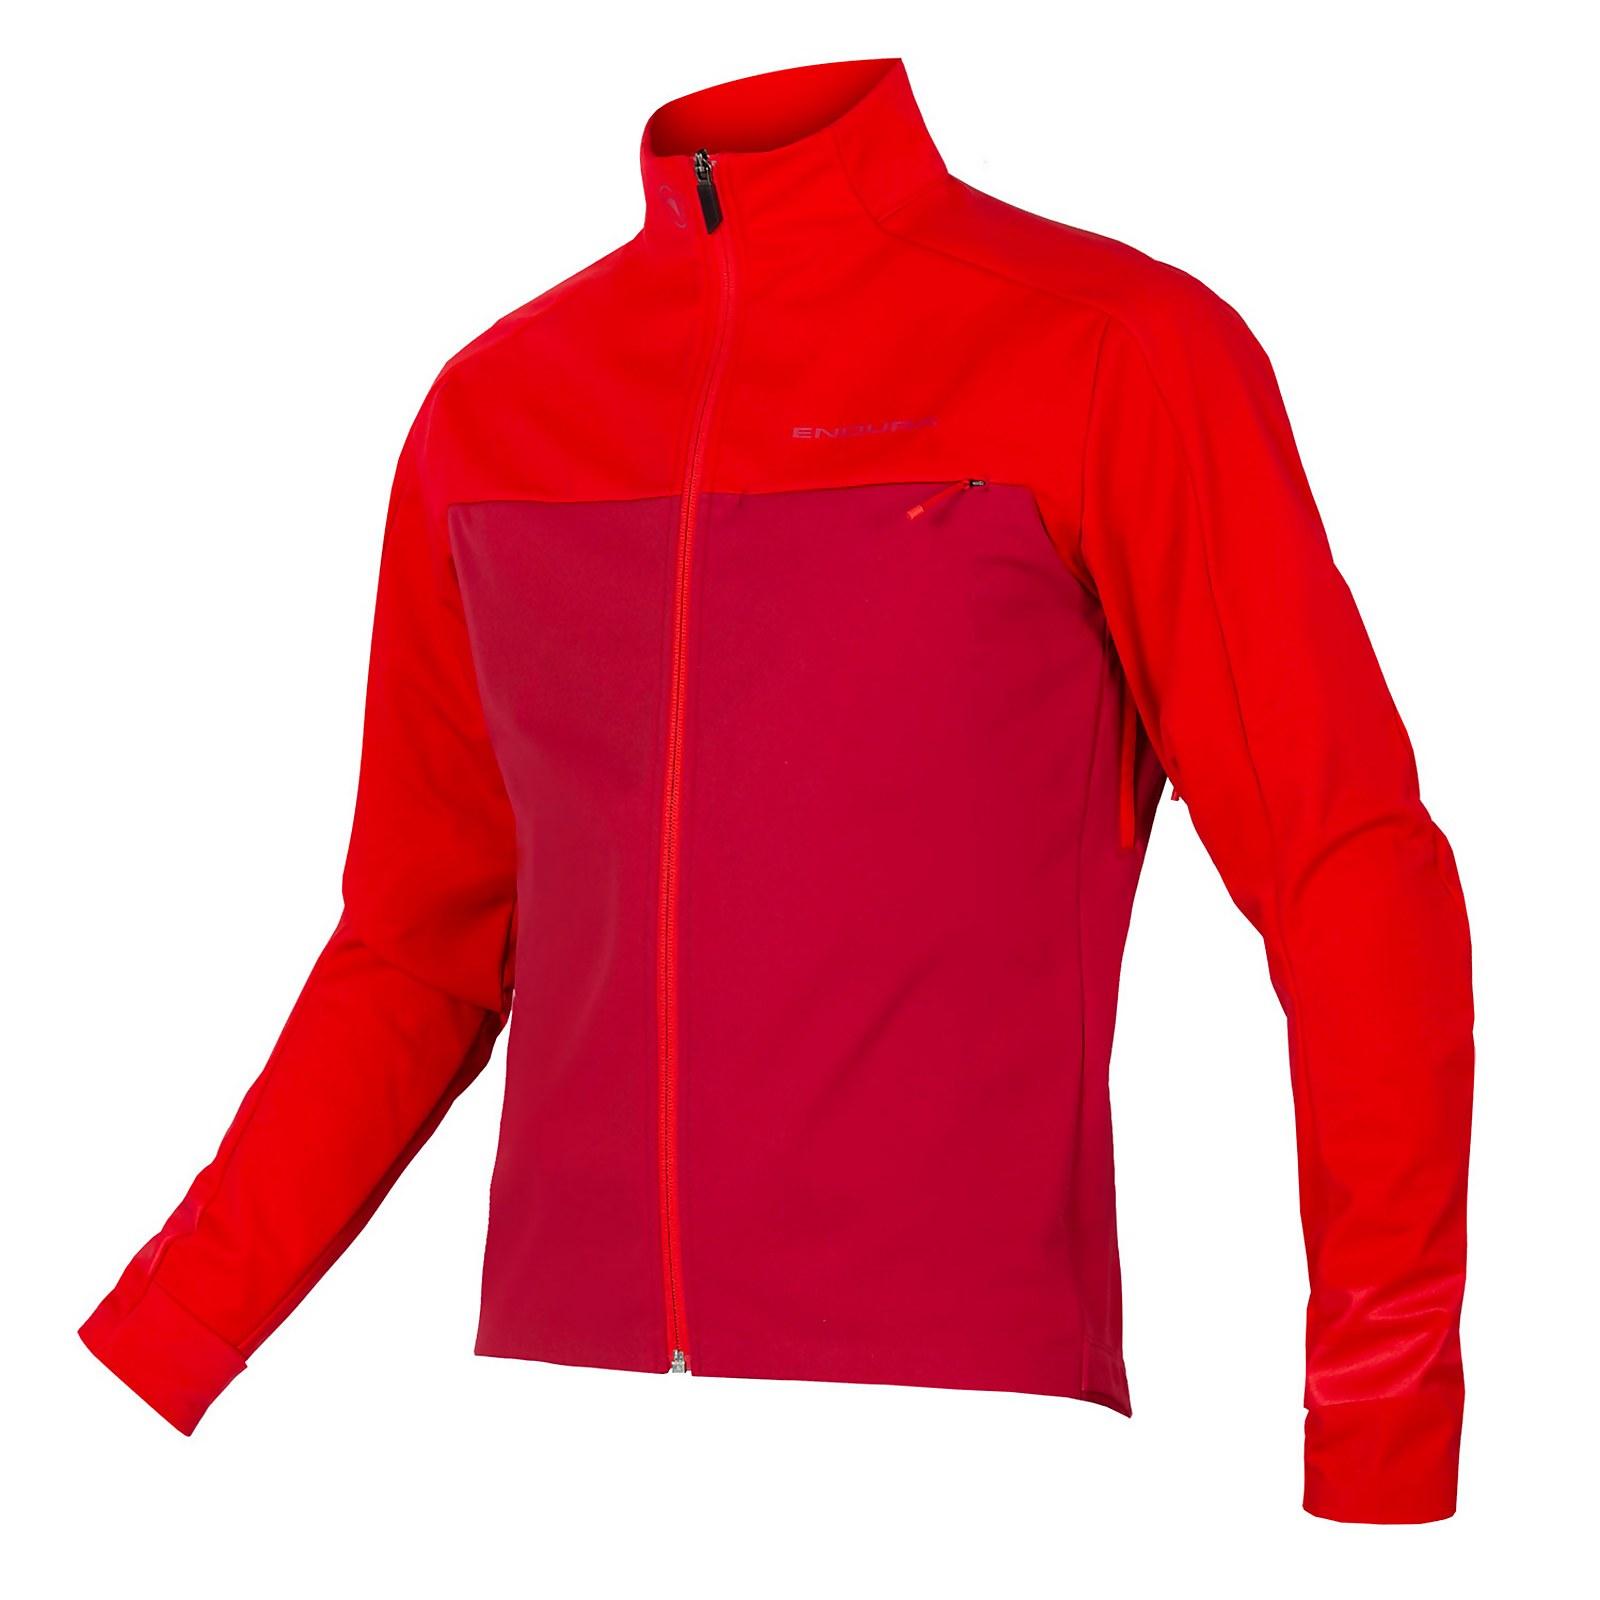 Windchill Jacket Ii - Rust Red - Xxxl